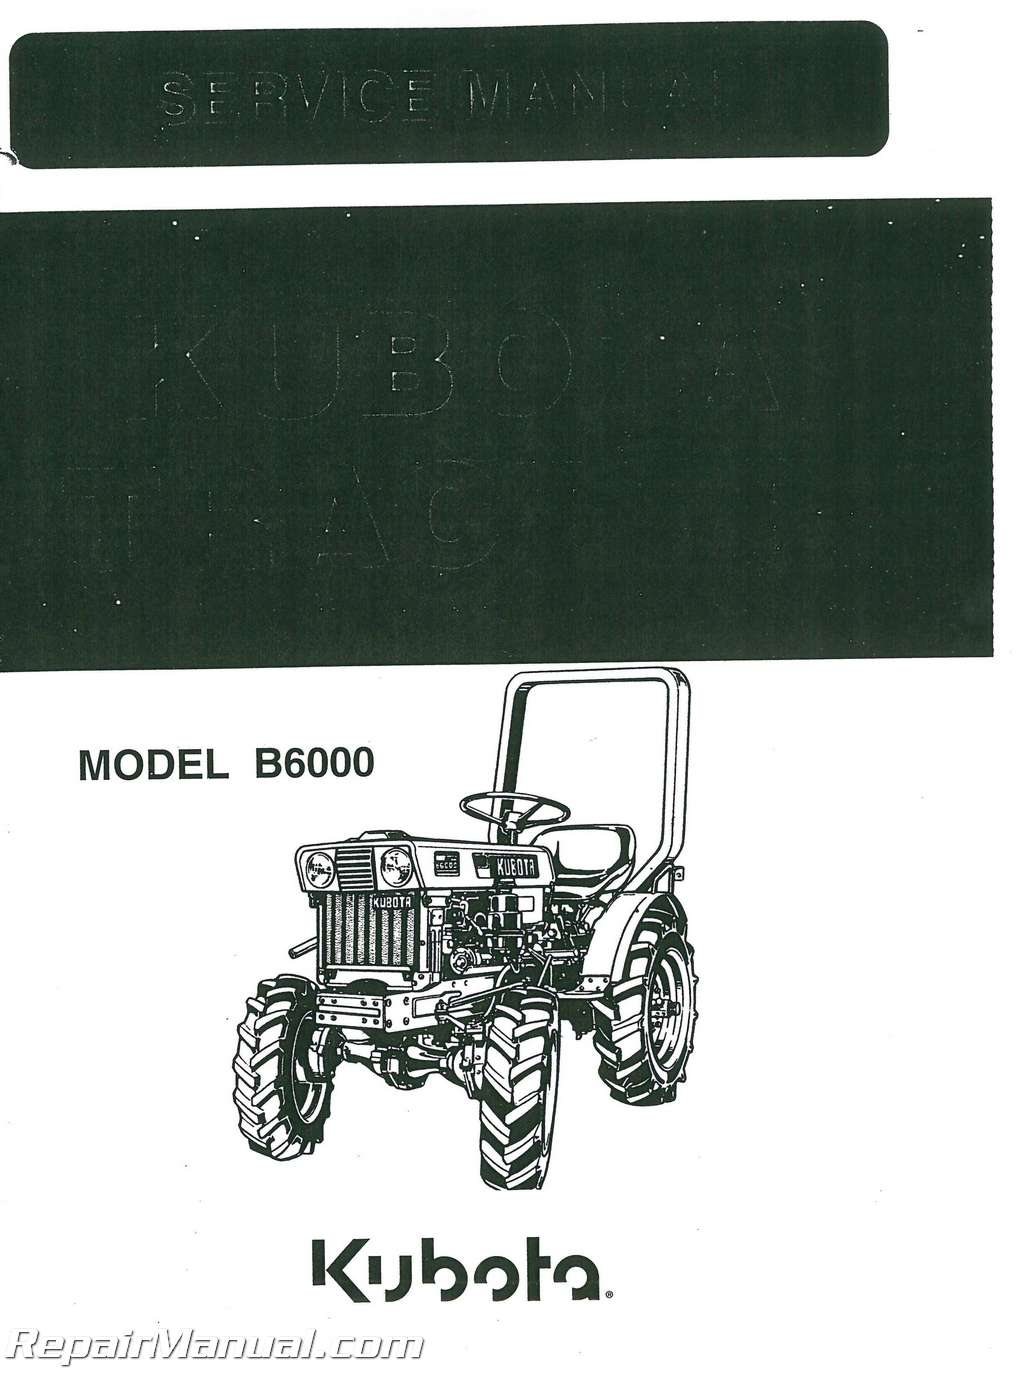 Kubota B Dsl Tractor Service Manual